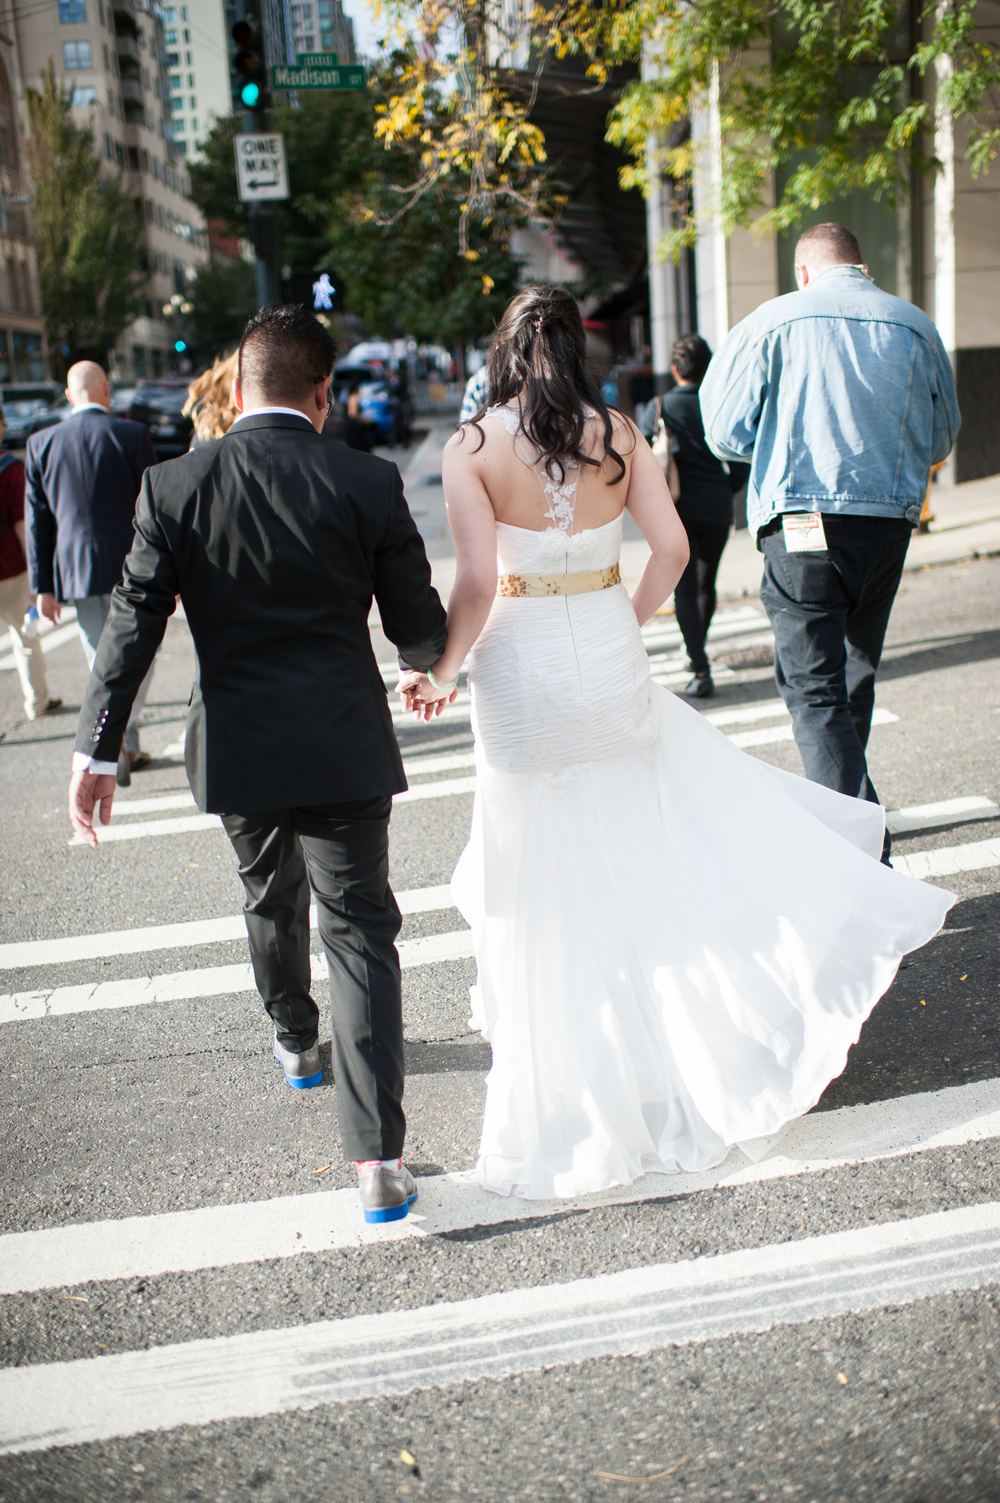 hotel1000downtownstreetwedding.jpg